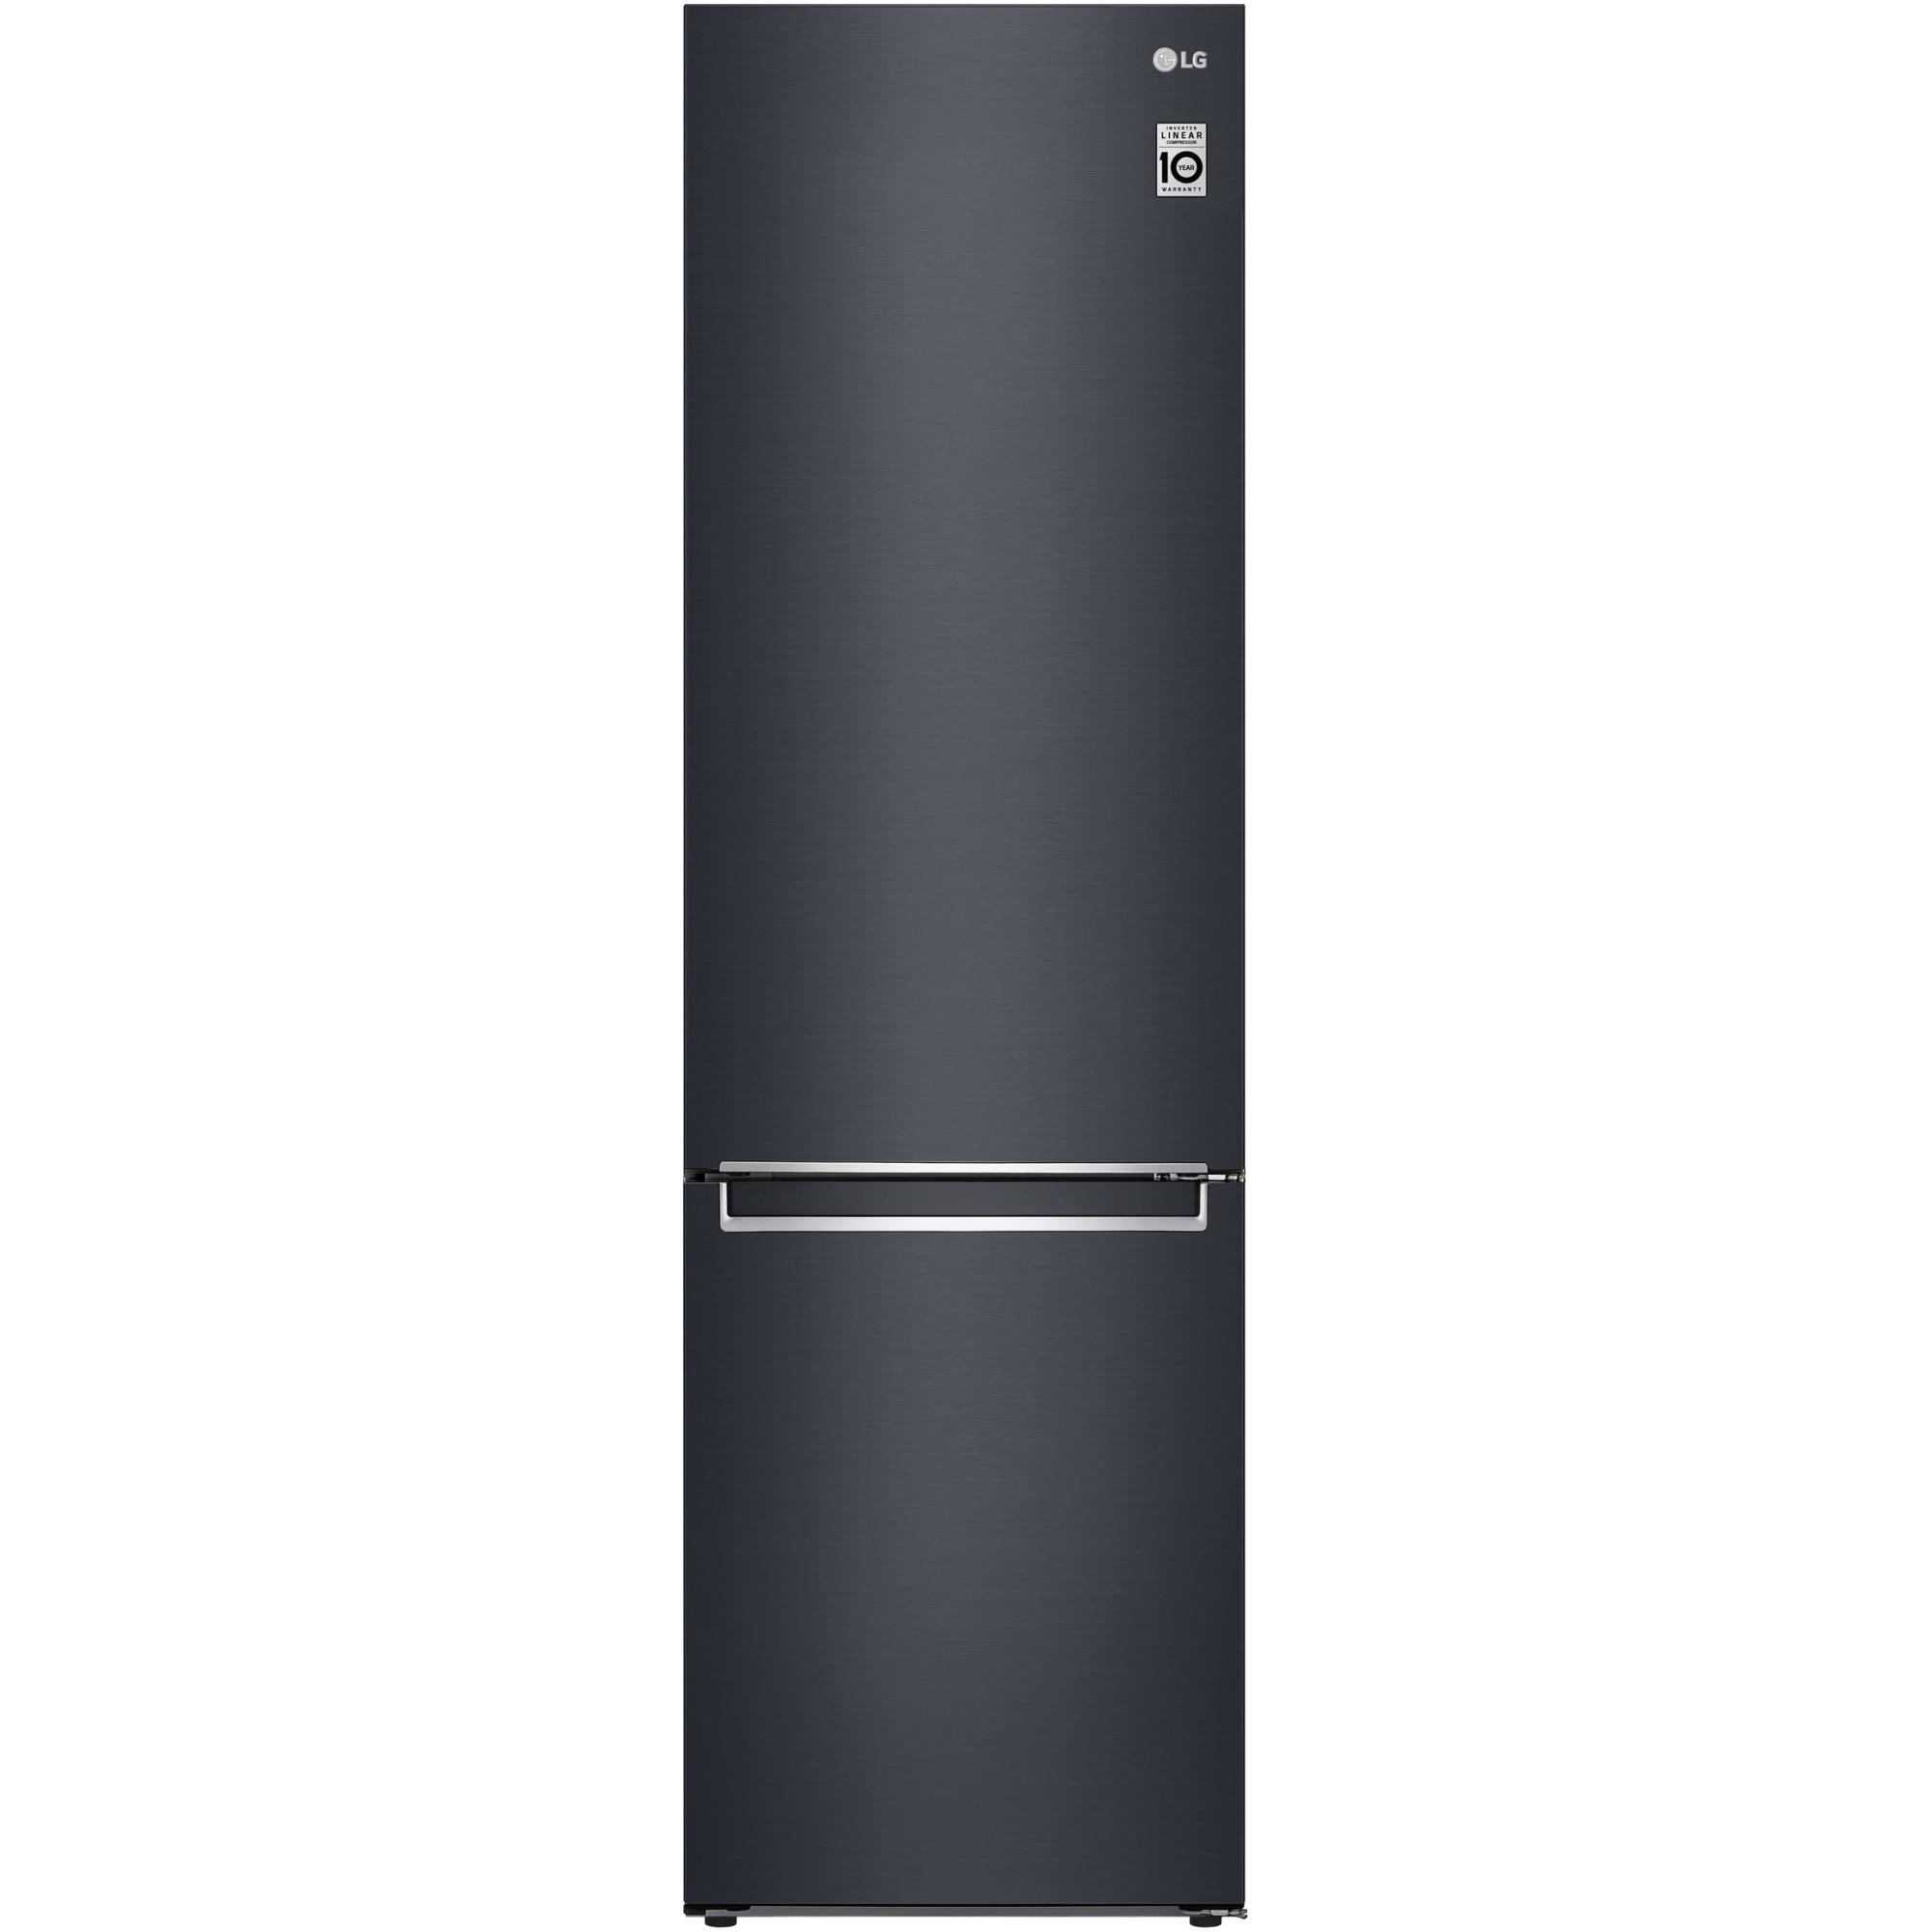 Fotografie Combina frigorifica LG GBB72MCVFN, 384 l, Clasa D, No Frost, Compresor Liniar Inverter, NatureFresh, DoorCooling, Afisaj LED, H 203 cm, Negru